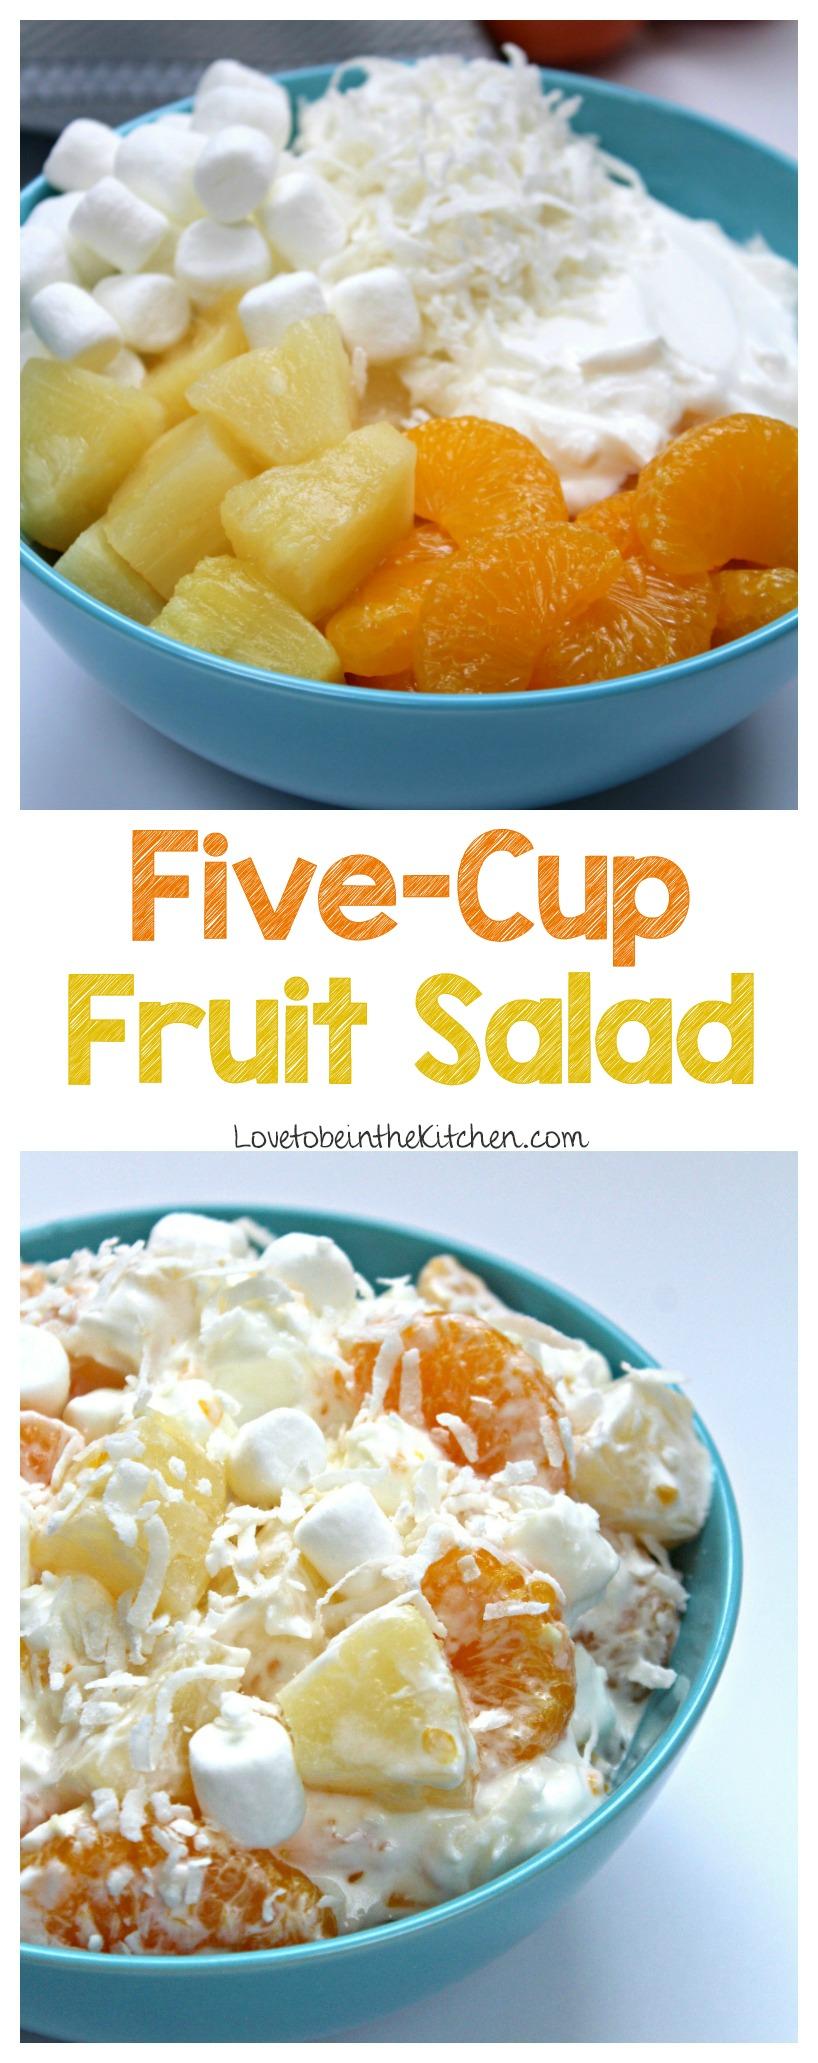 Five-Cup Fruit Salad